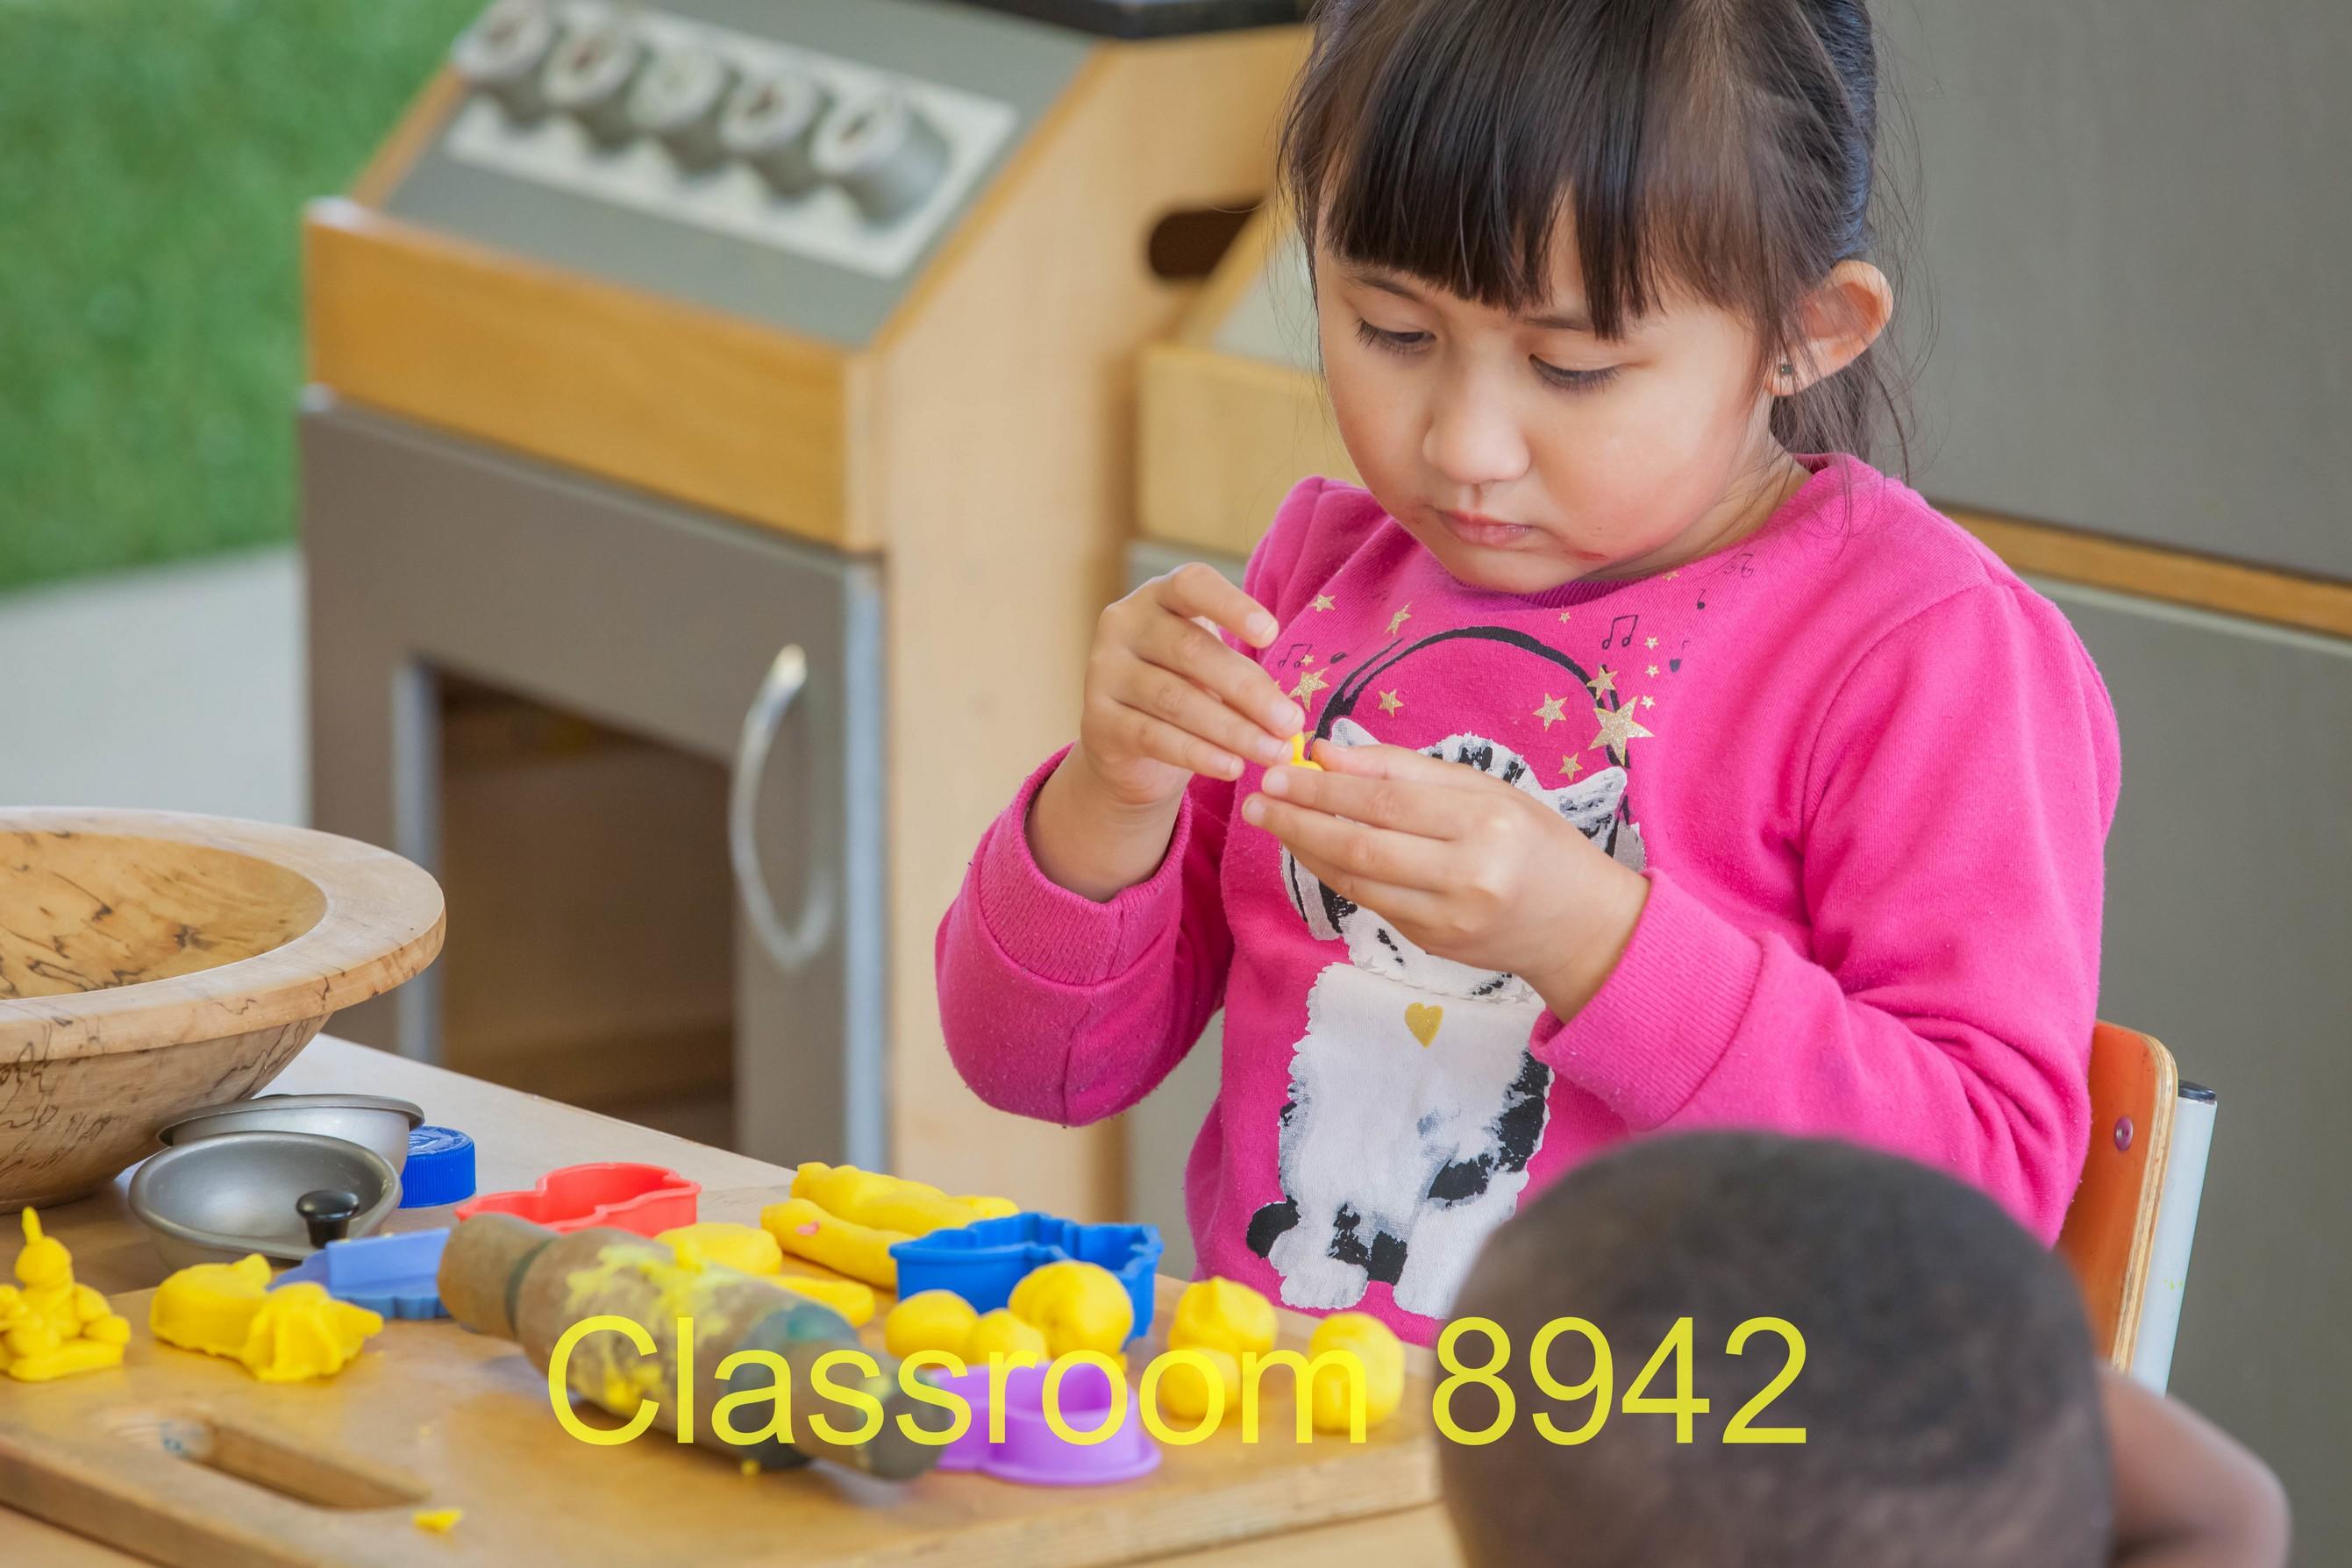 Classroom 8942